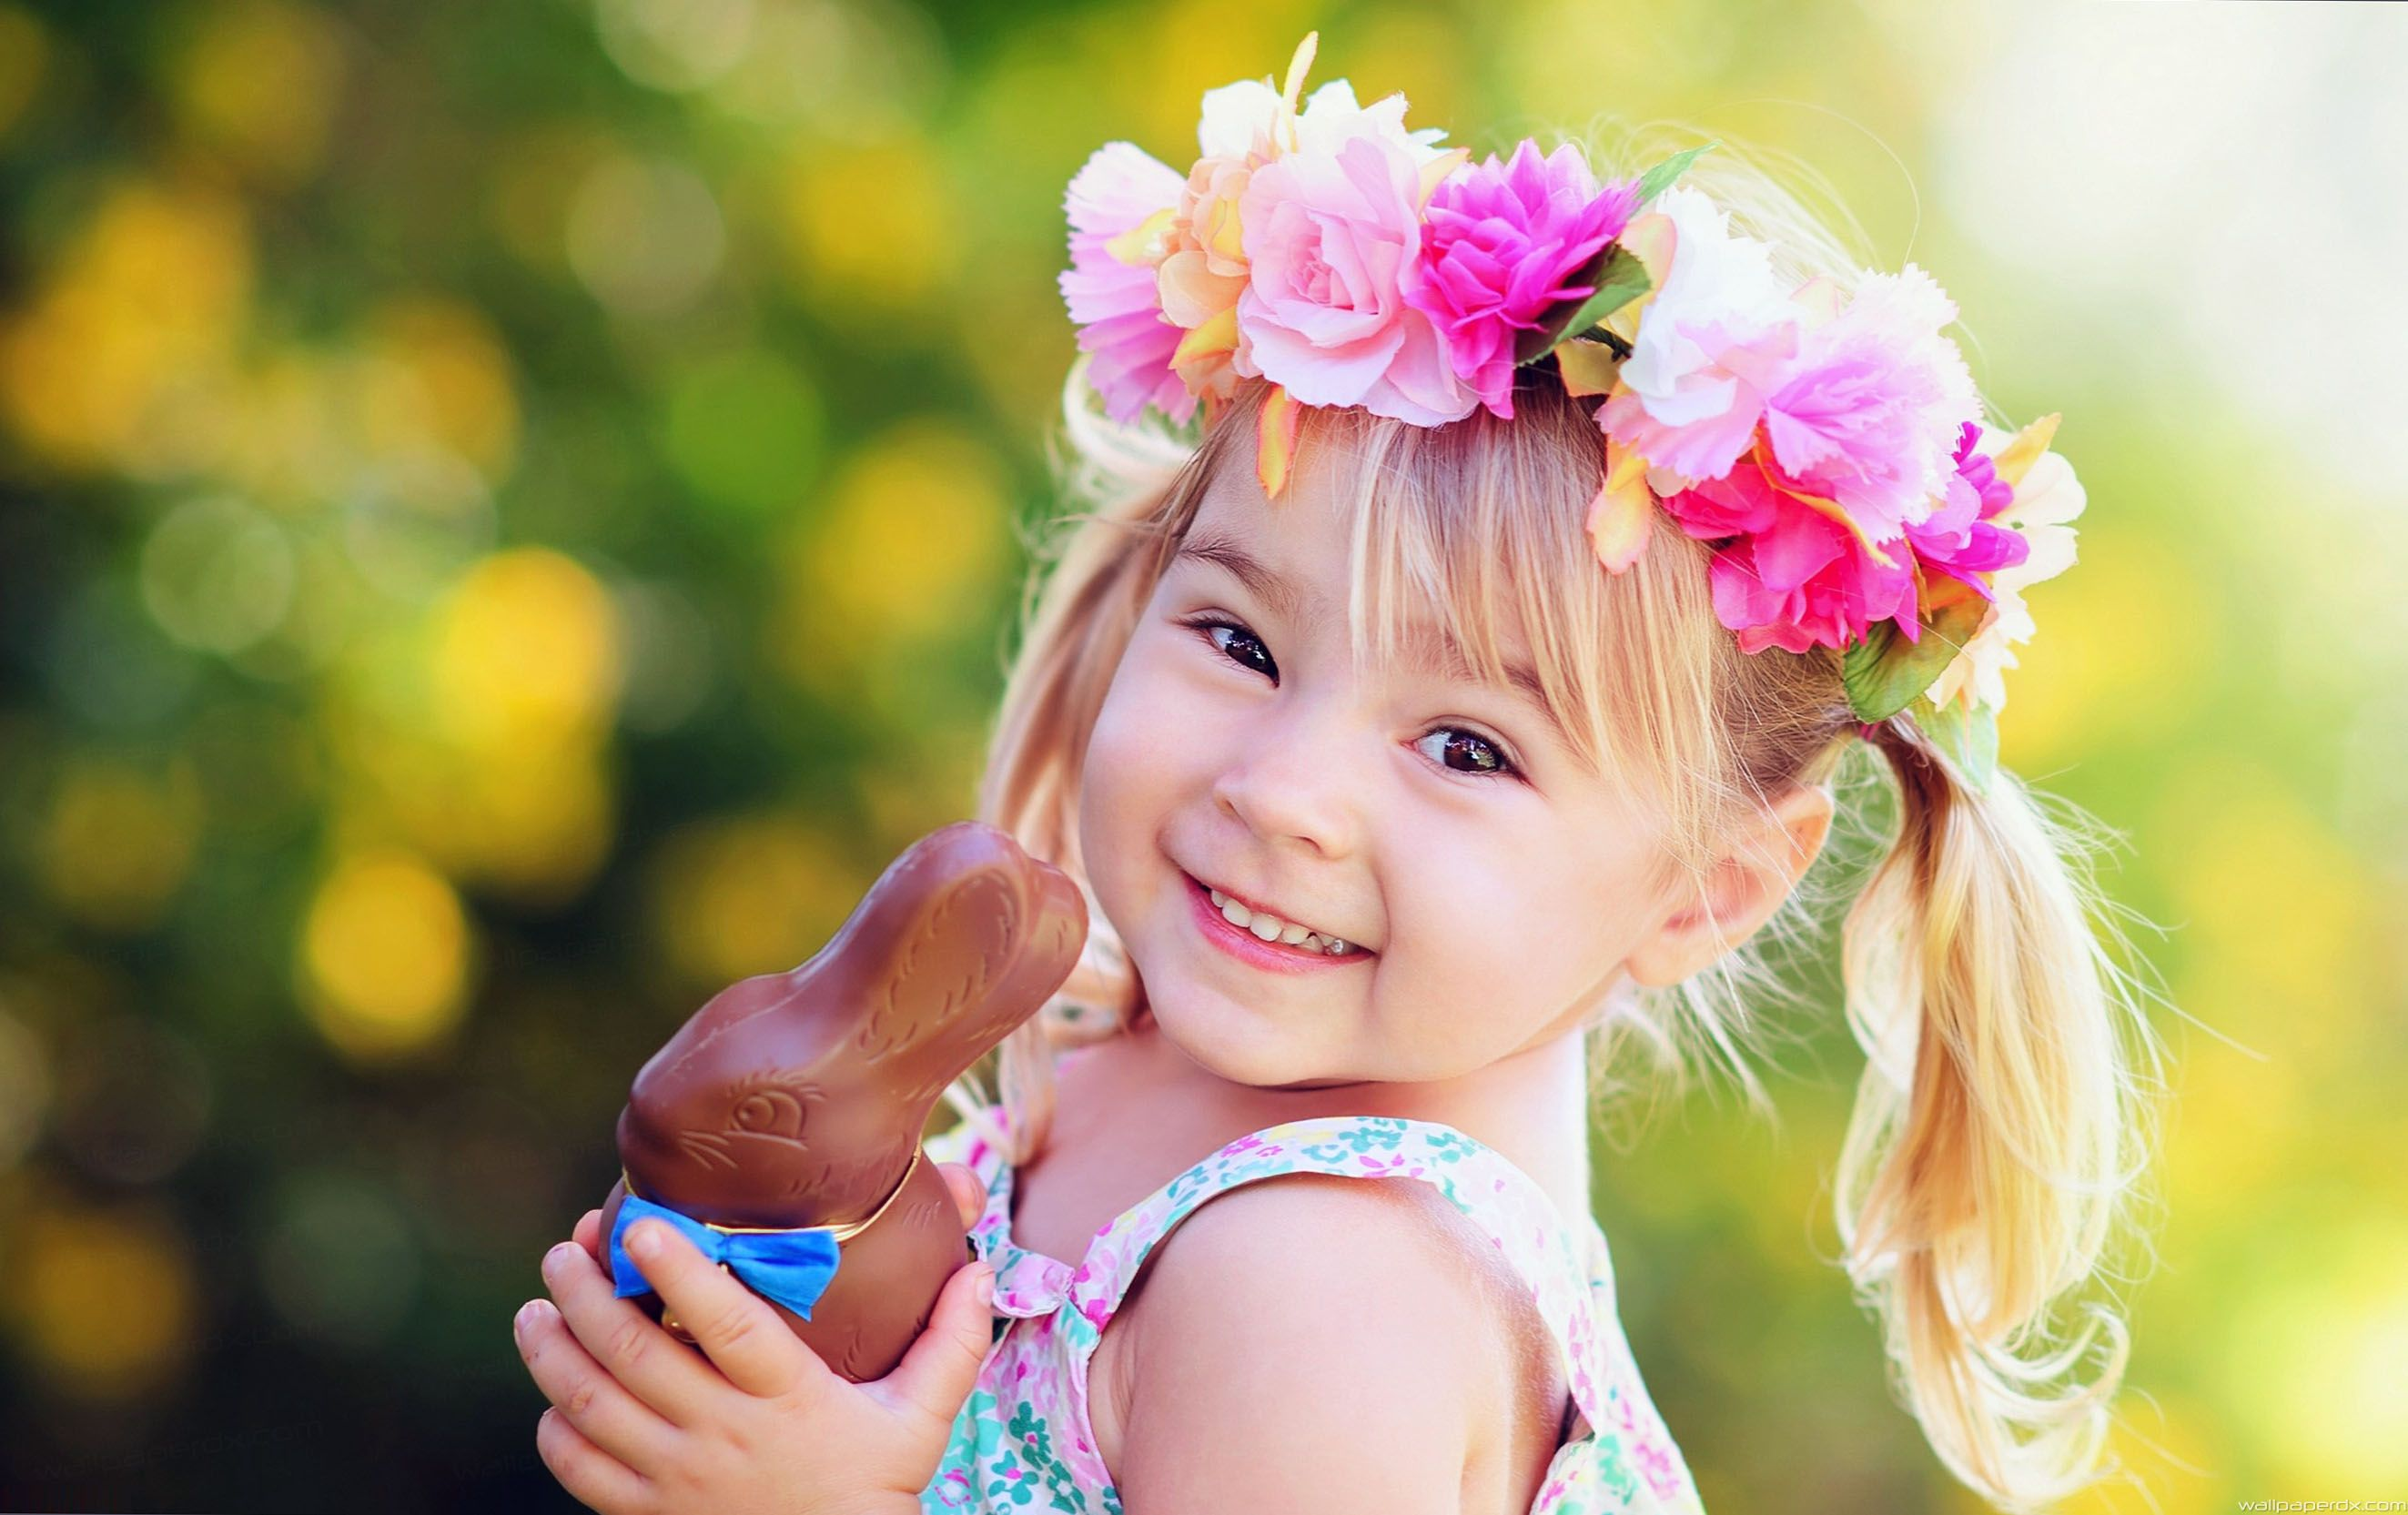 Cute Baby Pics Wallpapers 64 Images: Пин от пользователя Yasya Rivka на доске ПОД СТОЛ ПЕШКОМ